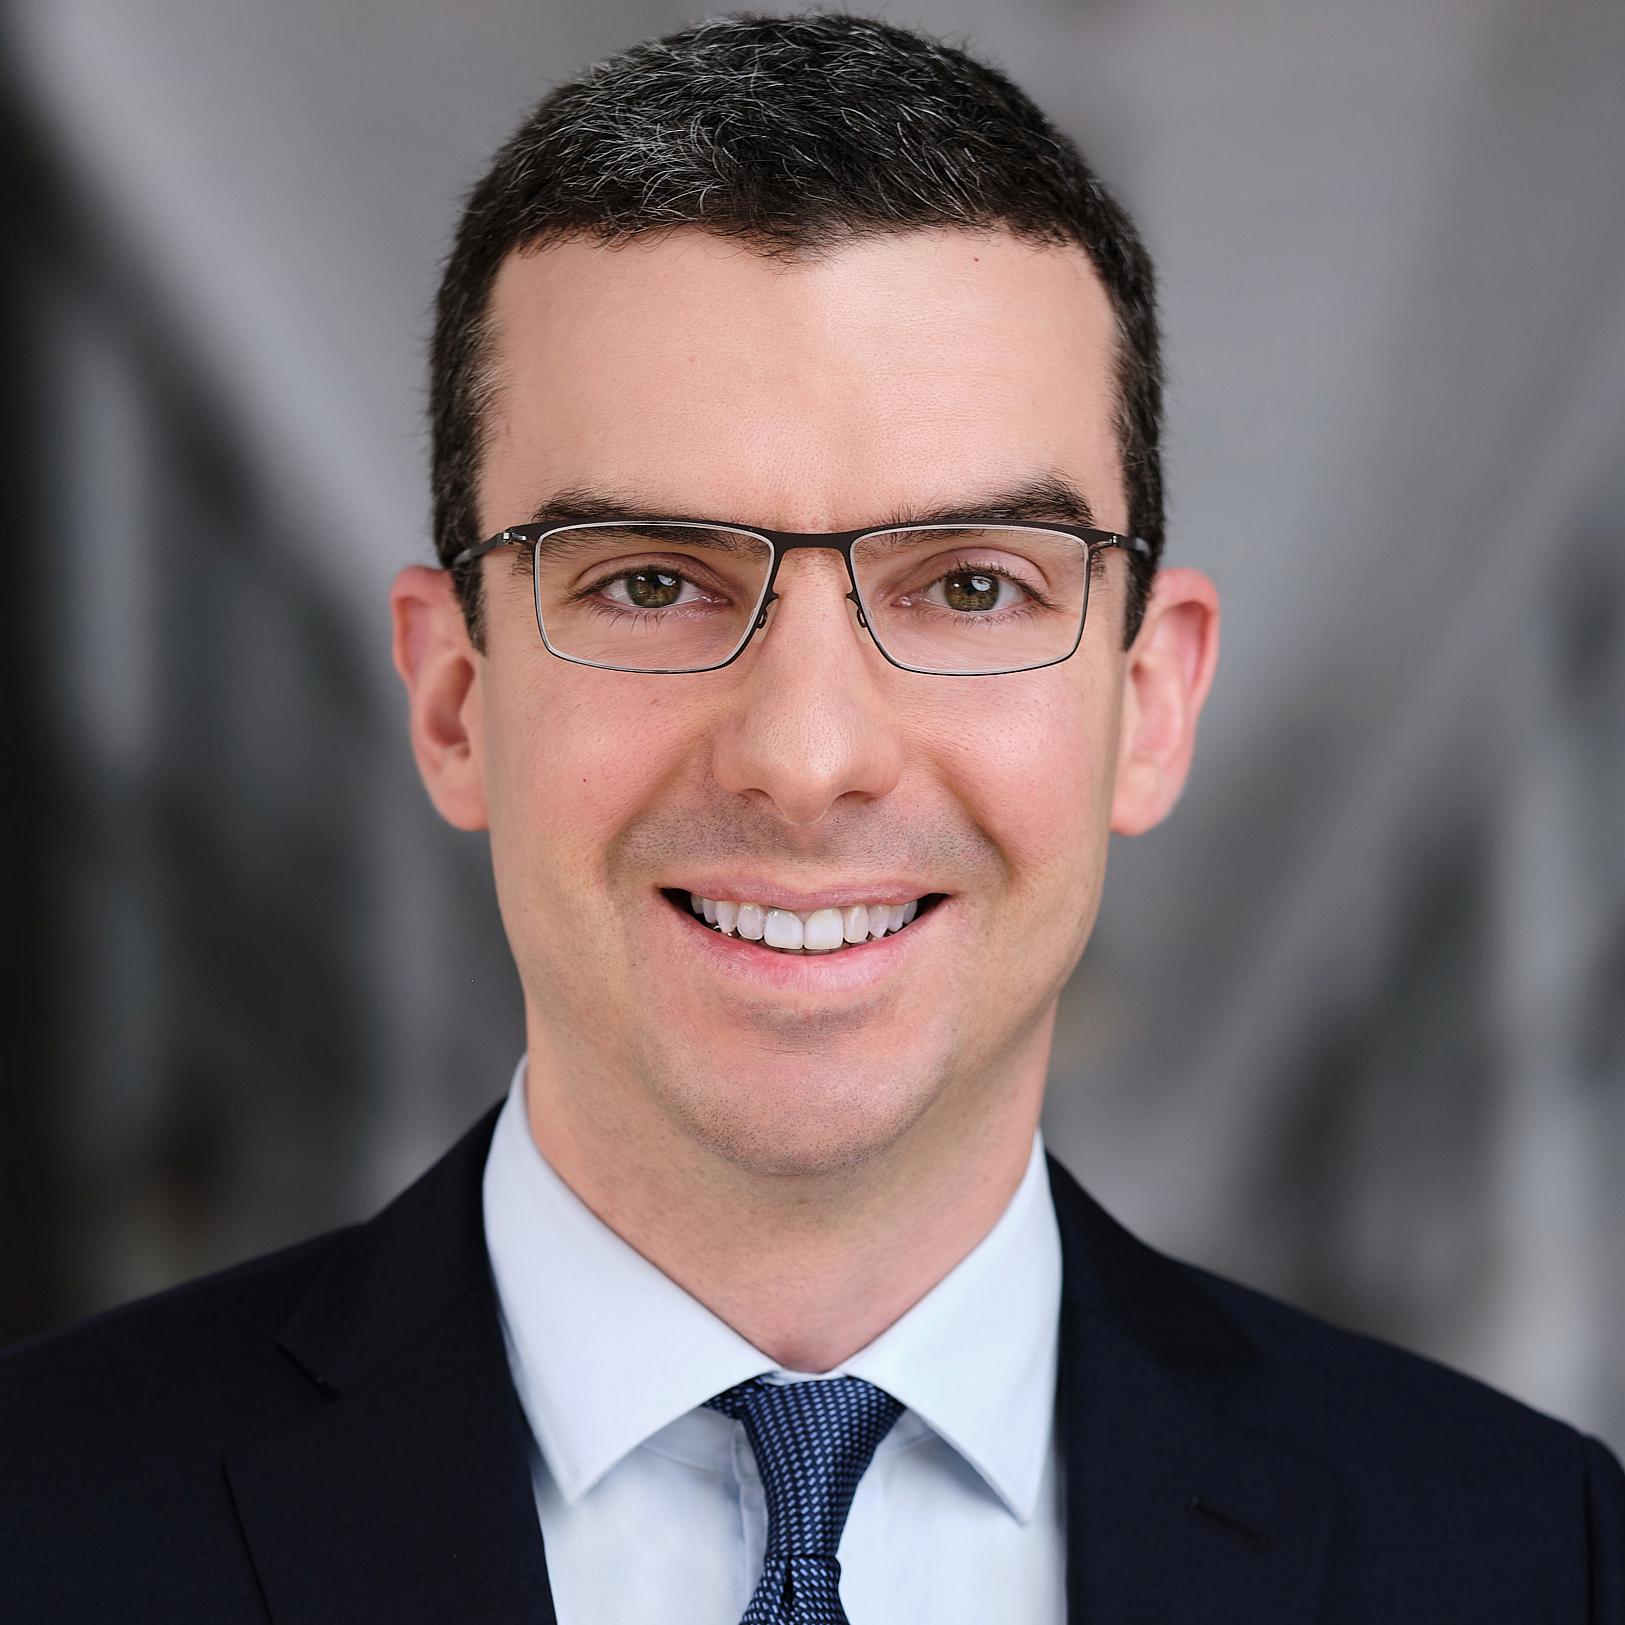 Adam Licurse, MD